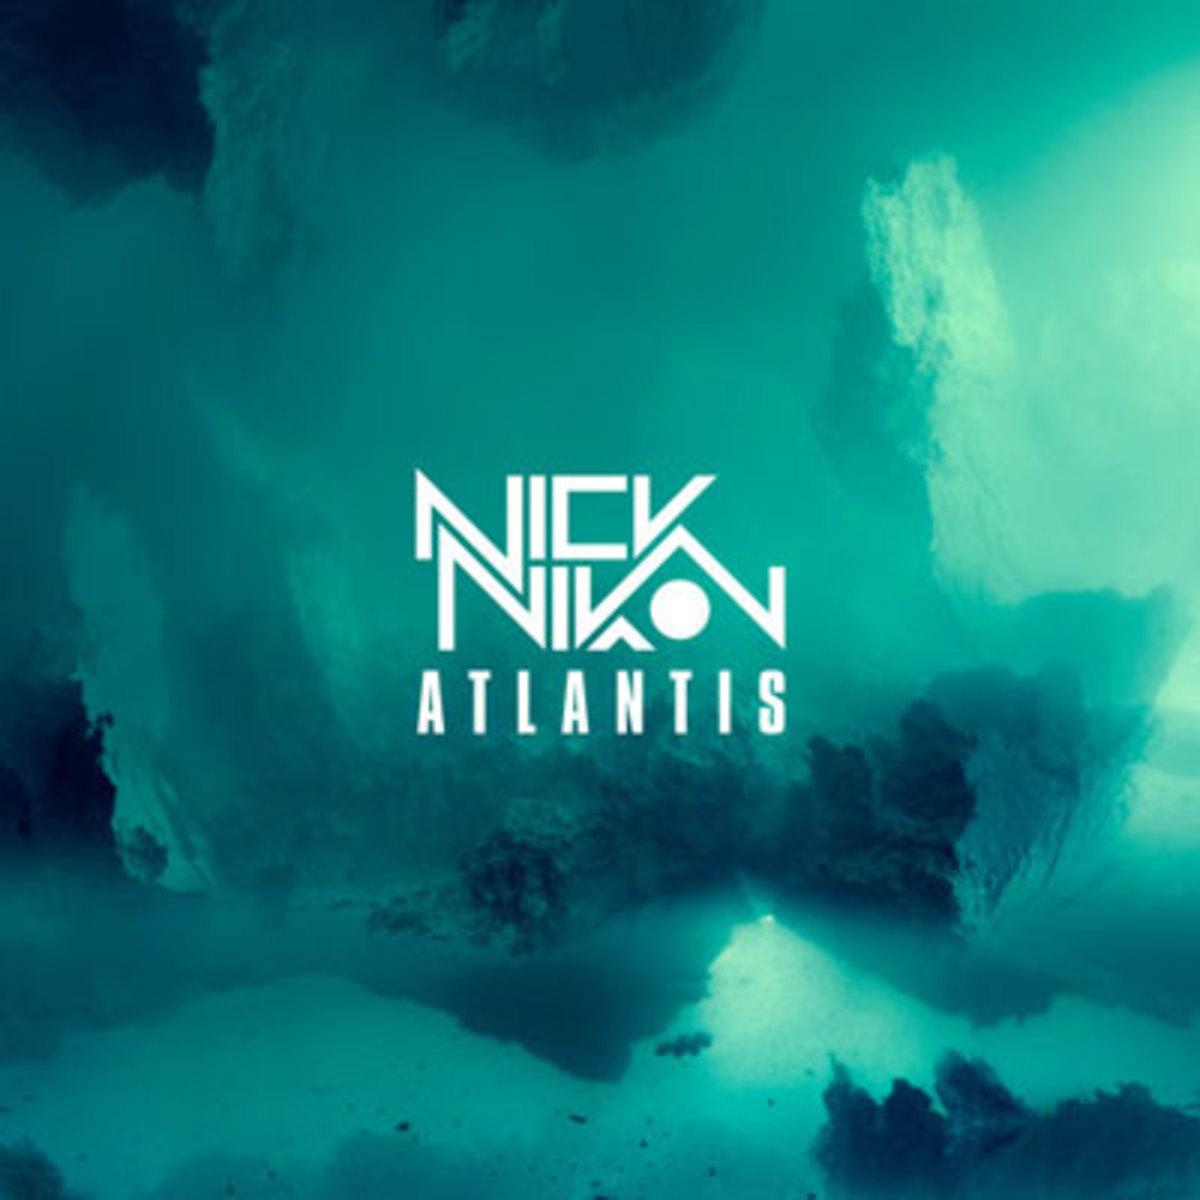 nick-nikon-atlantis.jpg